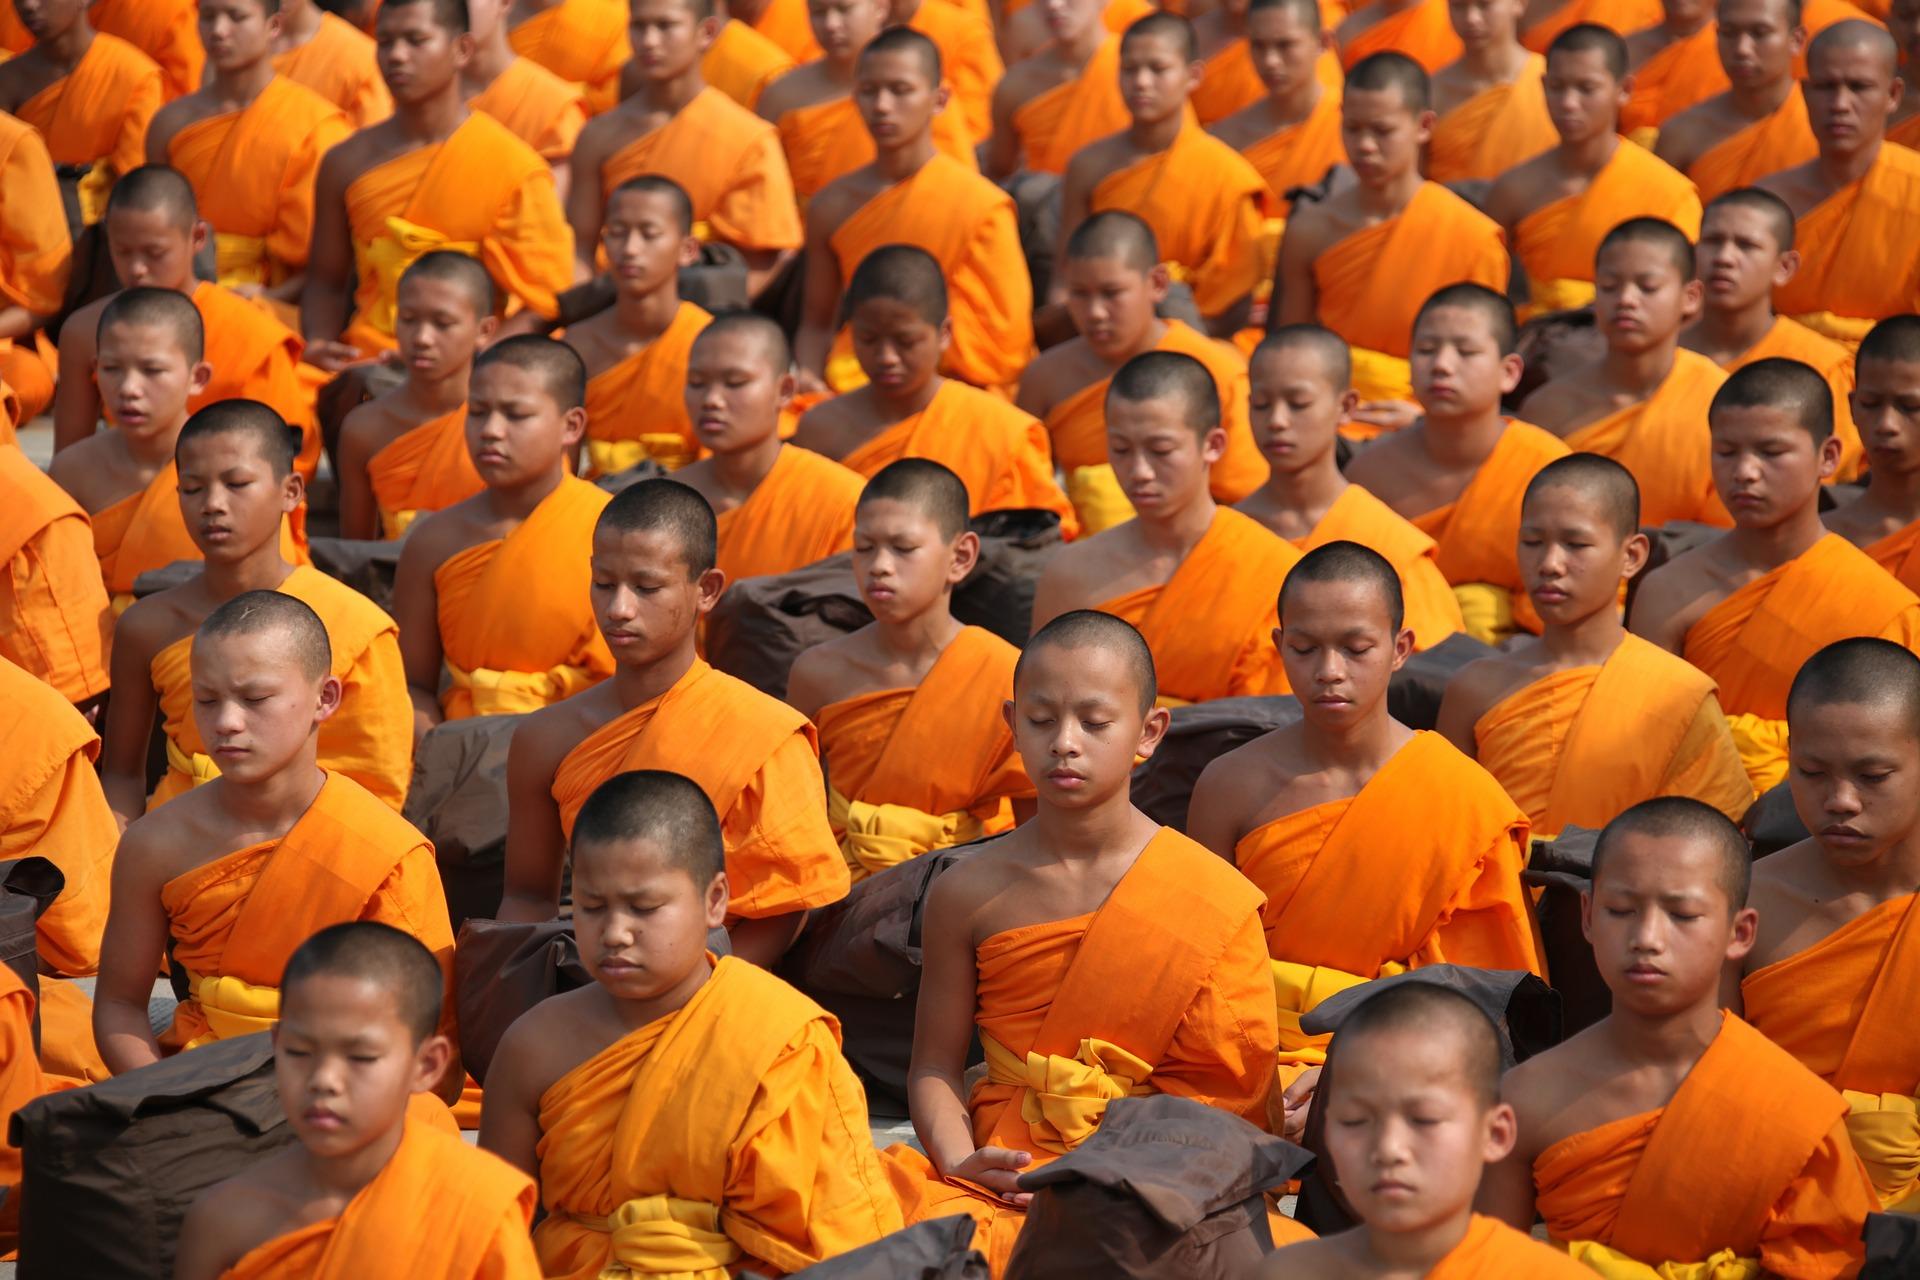 islatortugadivers.com koh tao breve introduccion al budismo rezando monjes